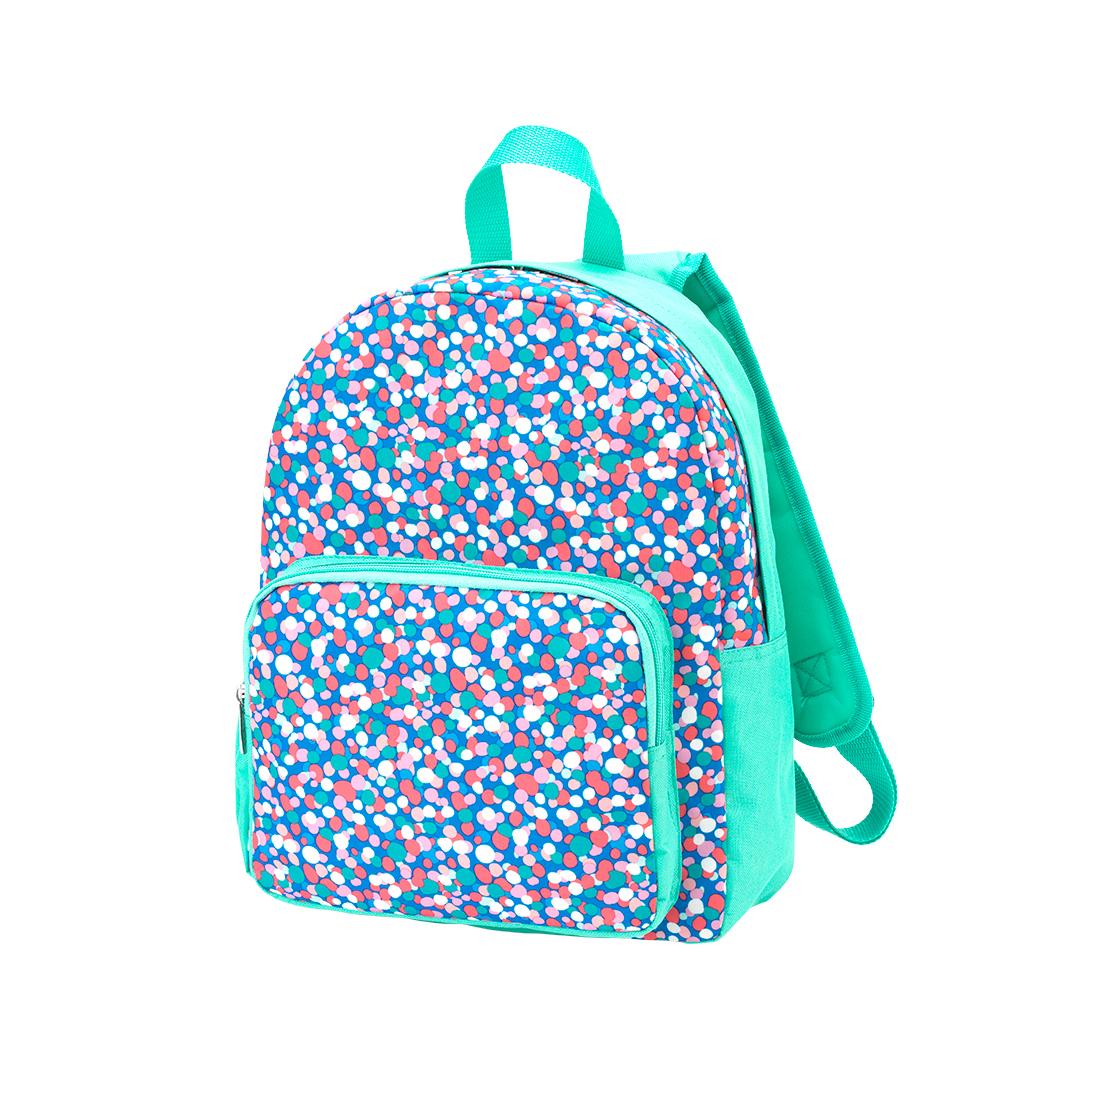 monogram preschool backpack personalized